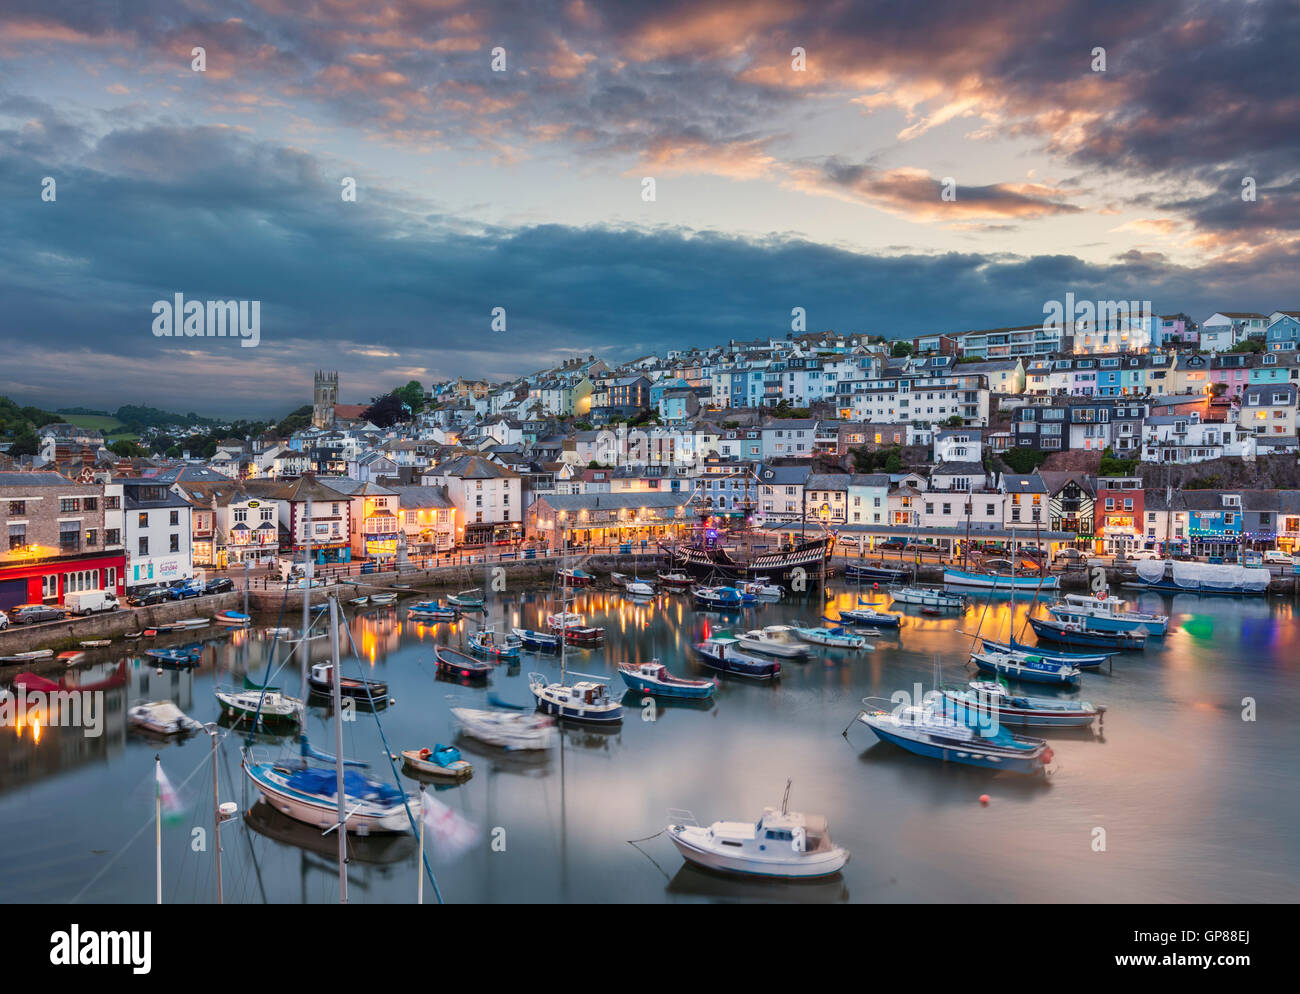 Brixham Hafen bei Sonnenuntergang Brixham Devon England UK GB EU Europe Stockbild